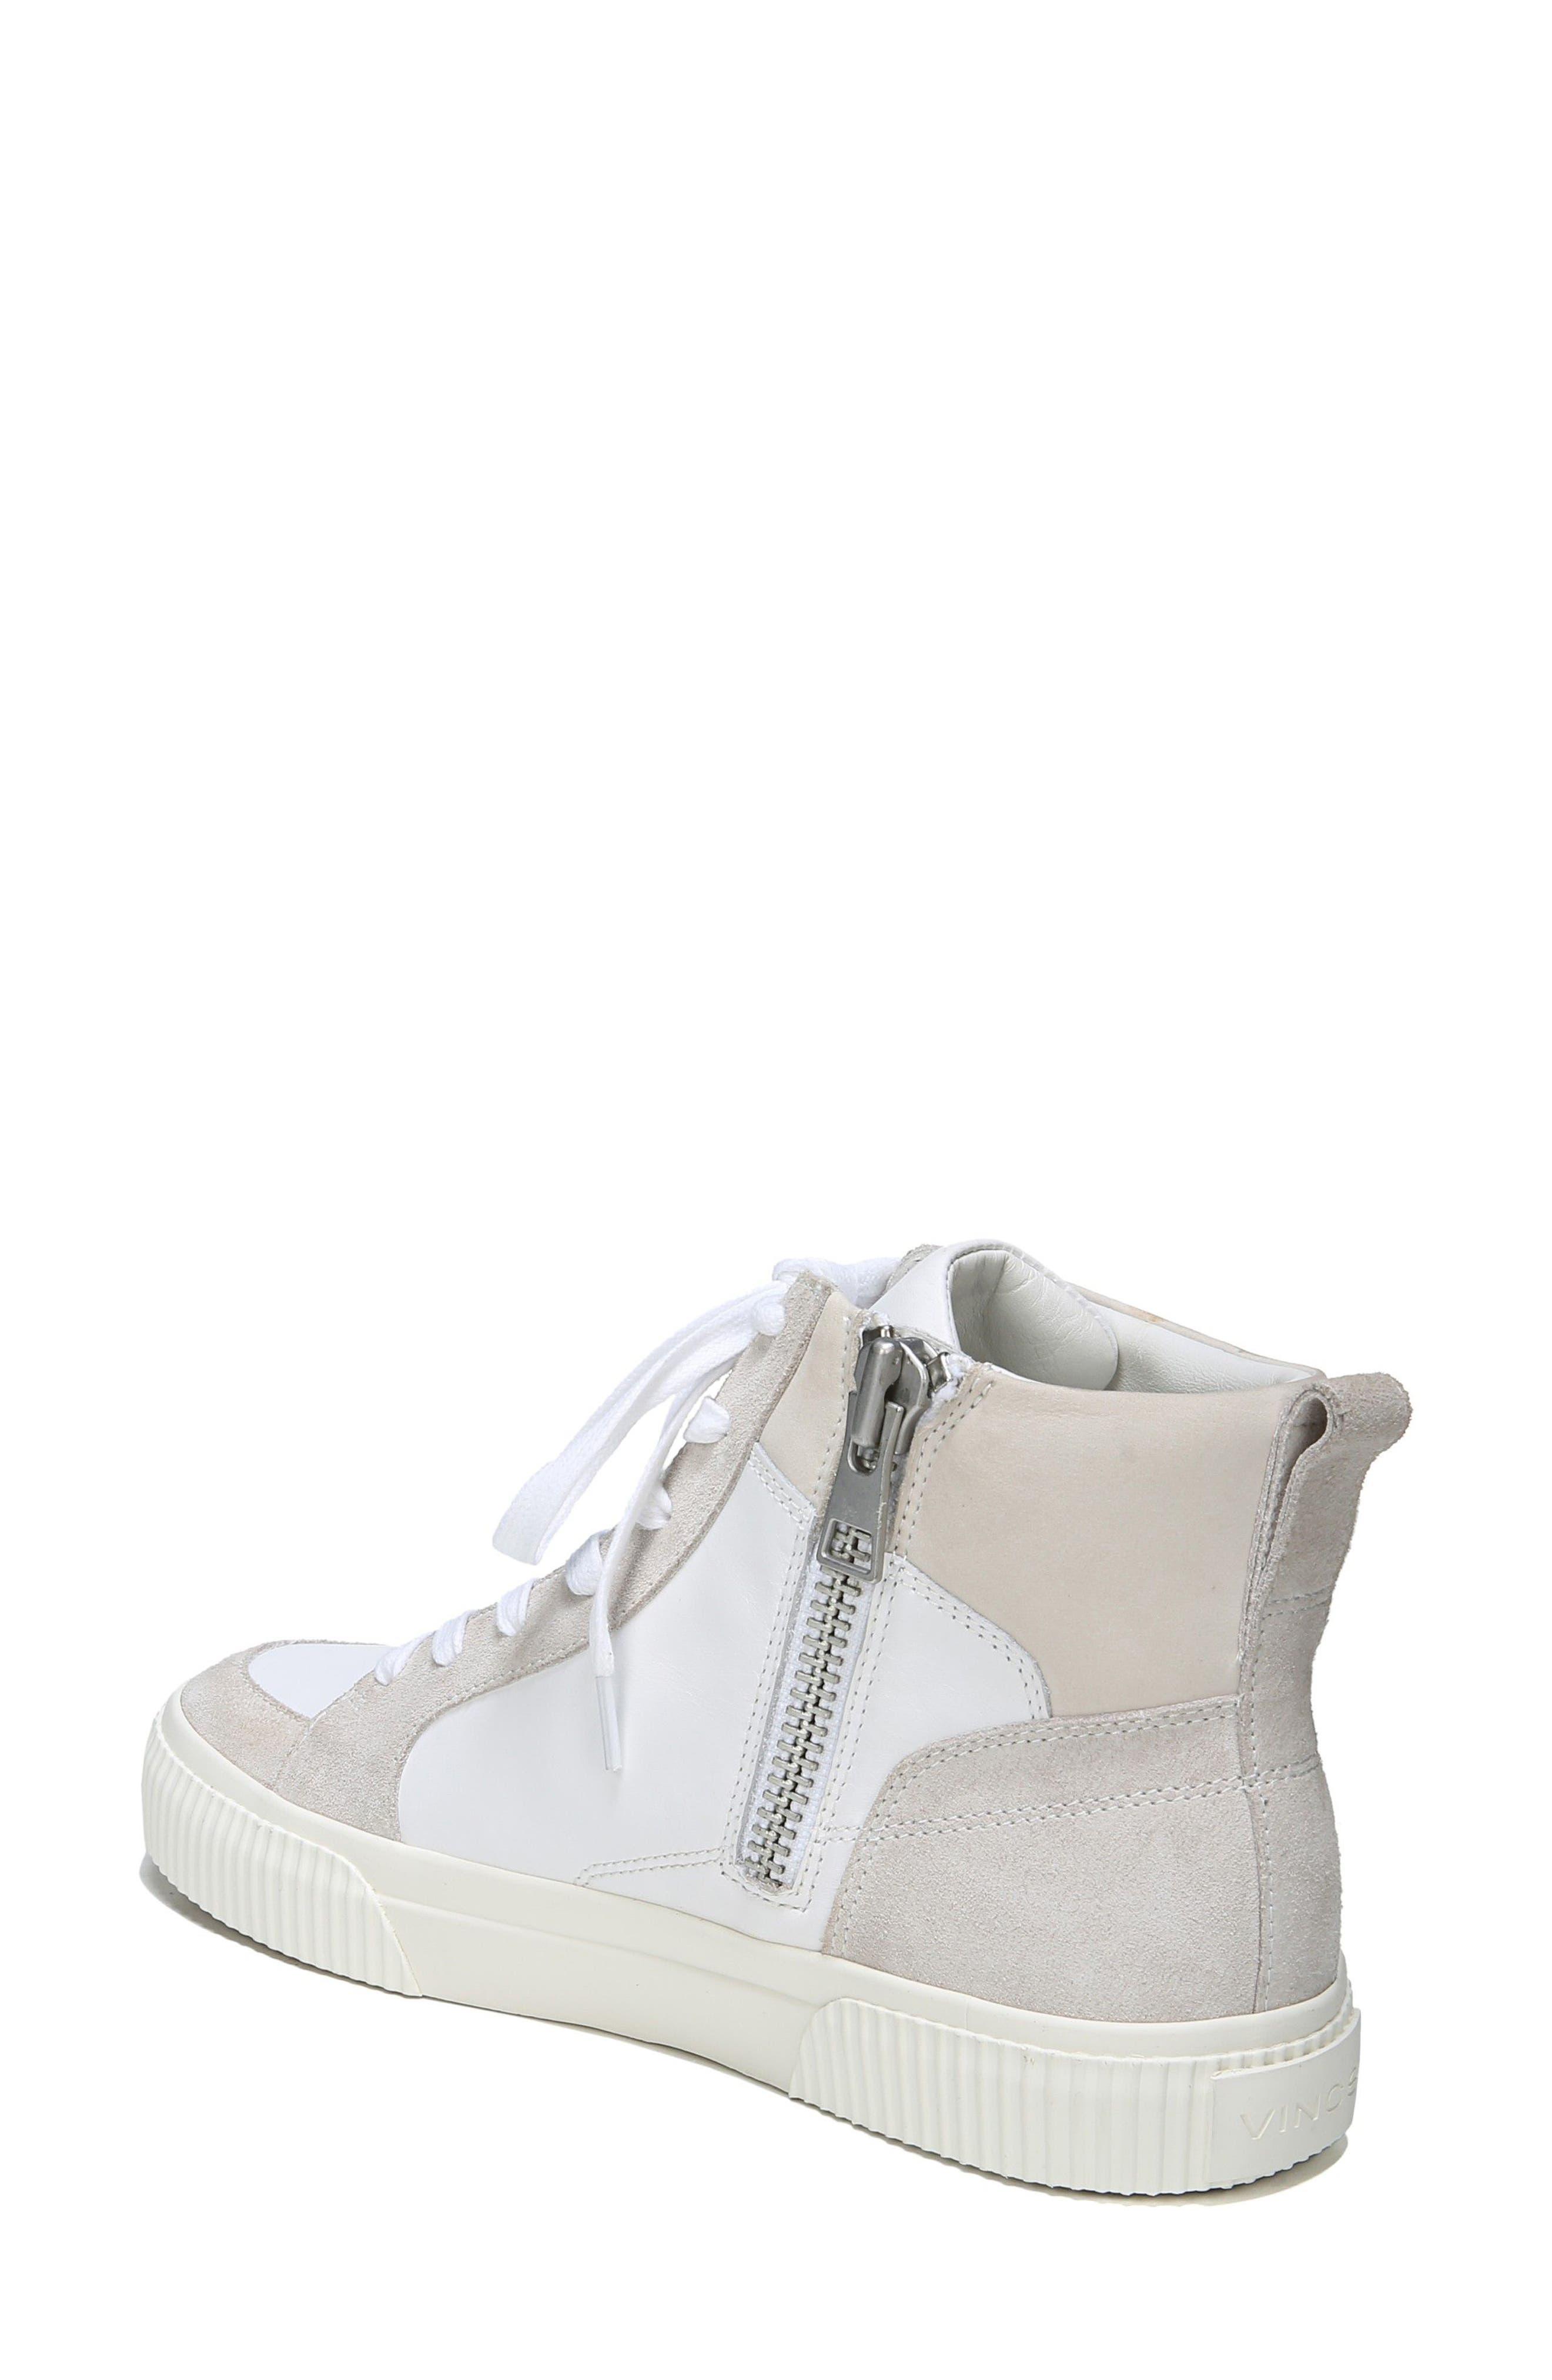 Kiles High-Top Sneaker,                             Alternate thumbnail 2, color,                             100